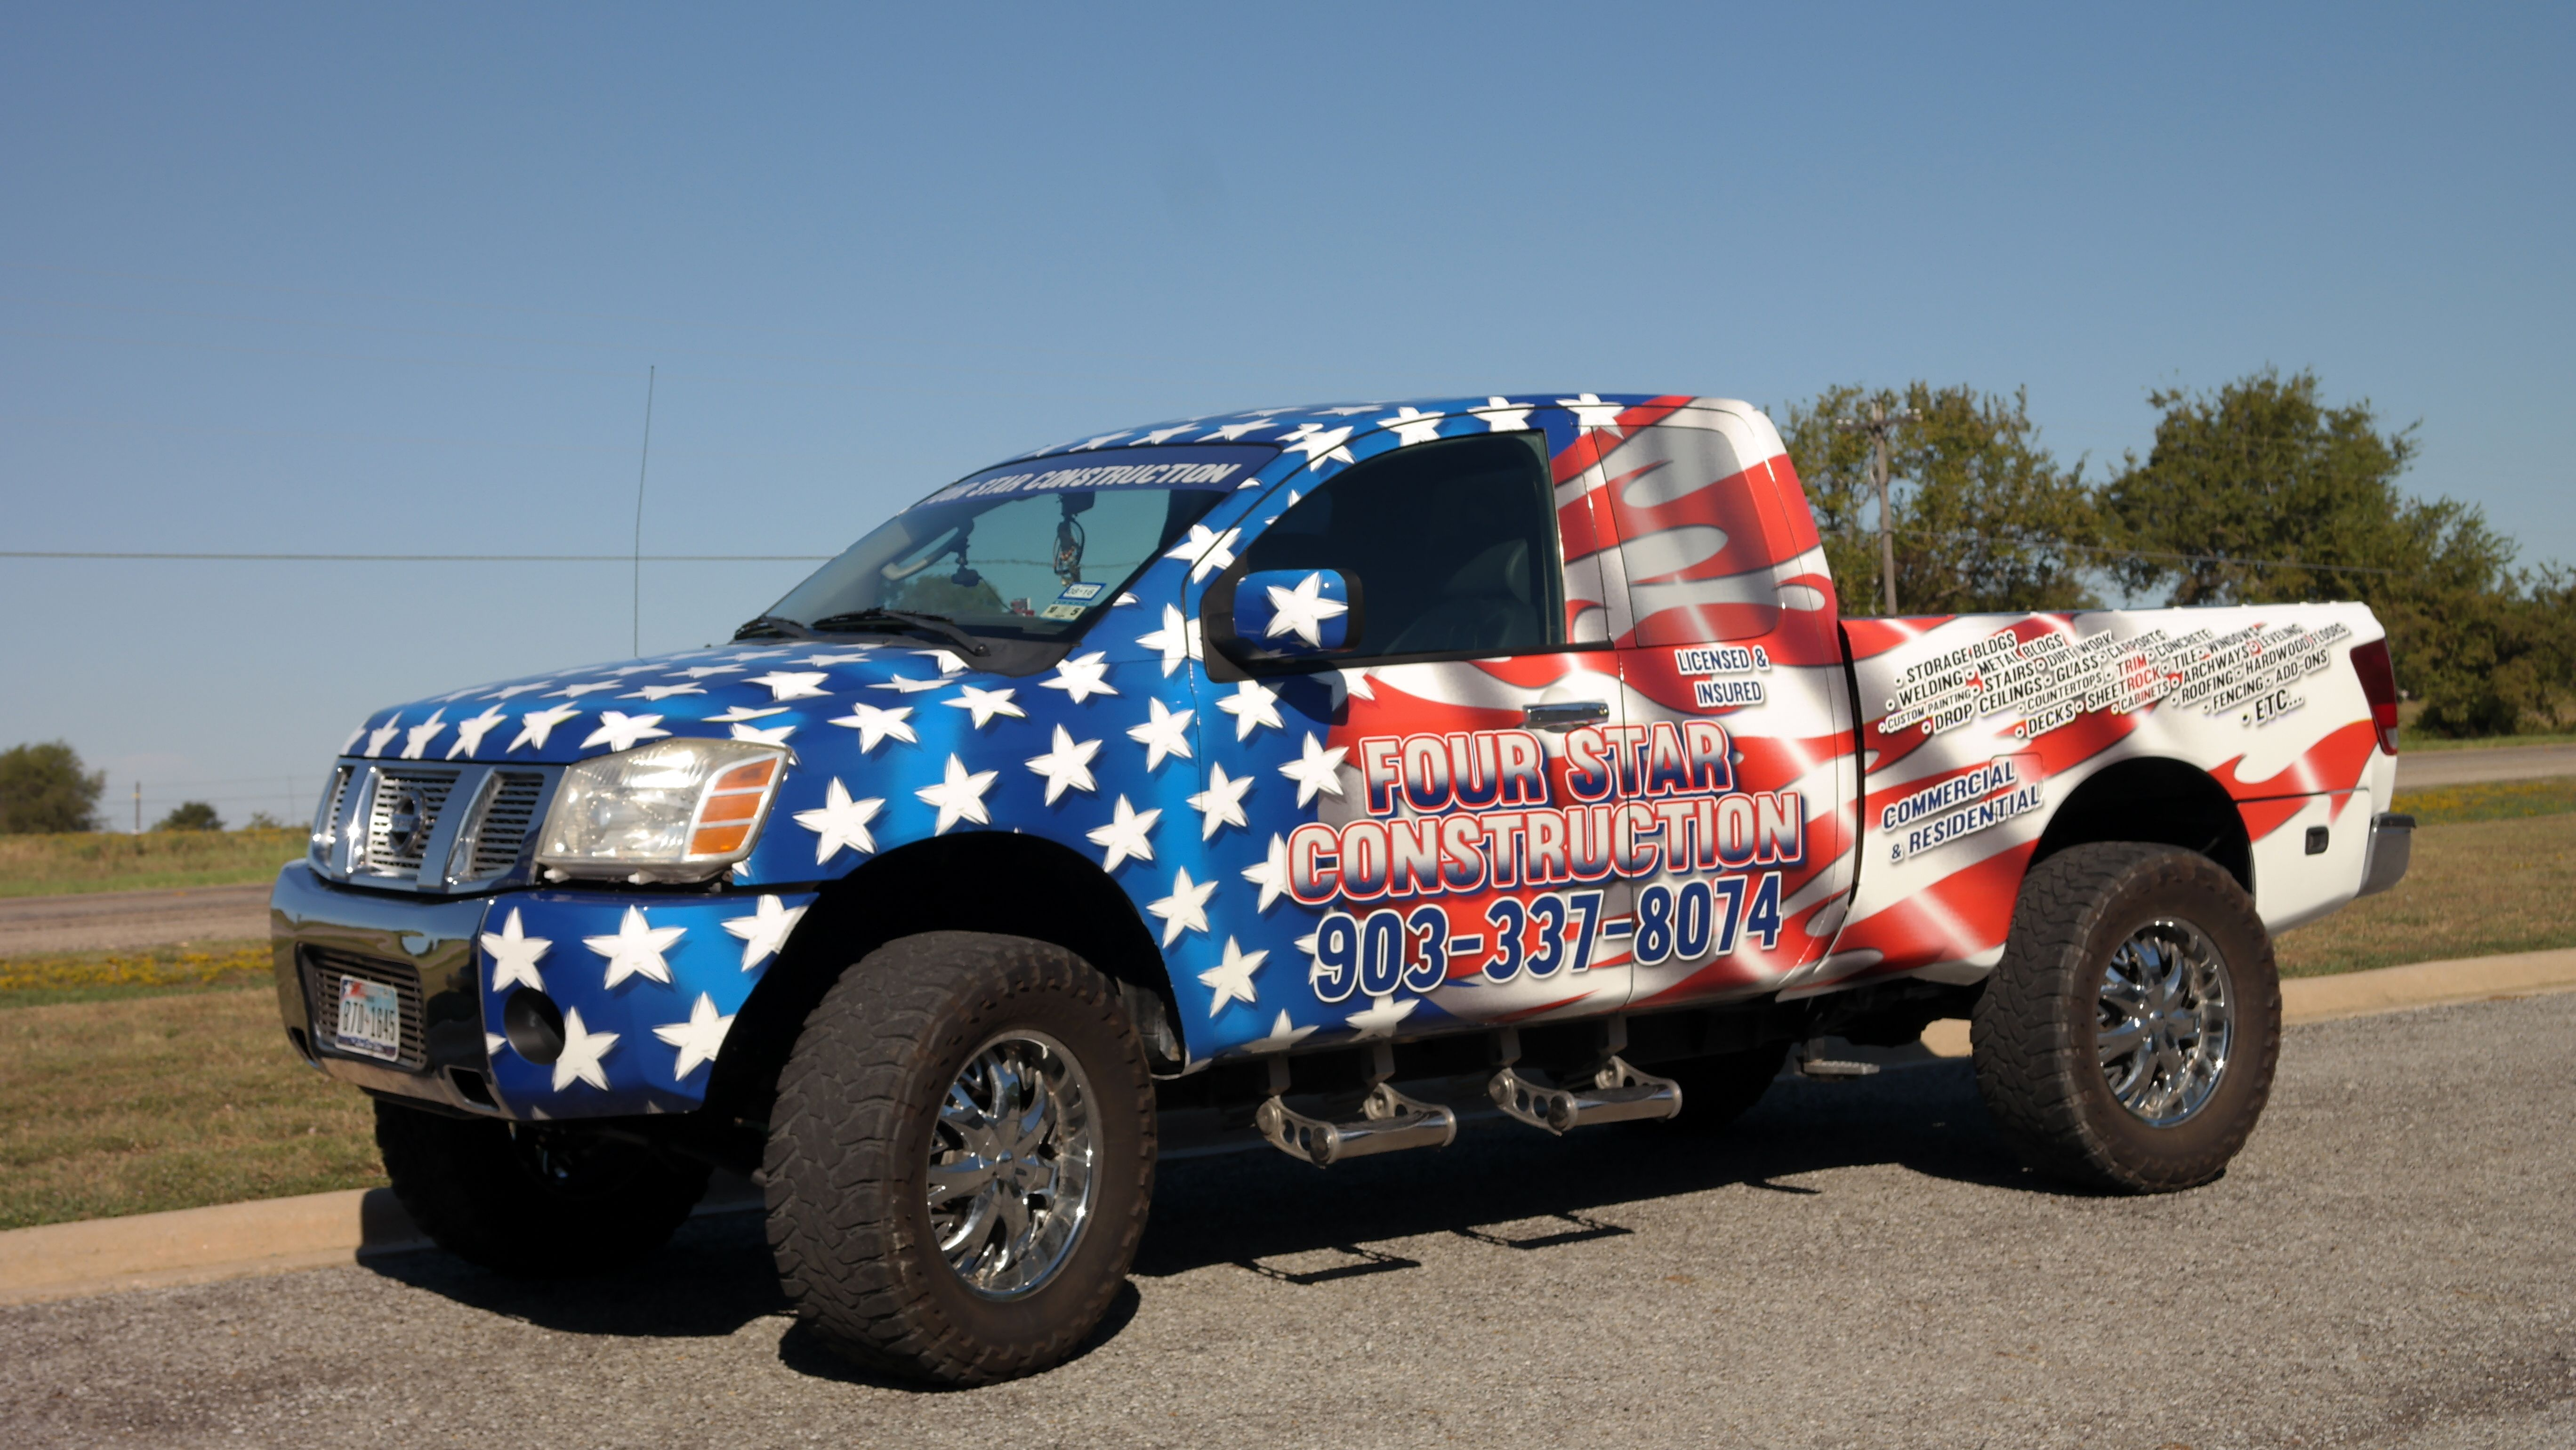 Patriotic full wrap on a Nissan Titan for Four Star